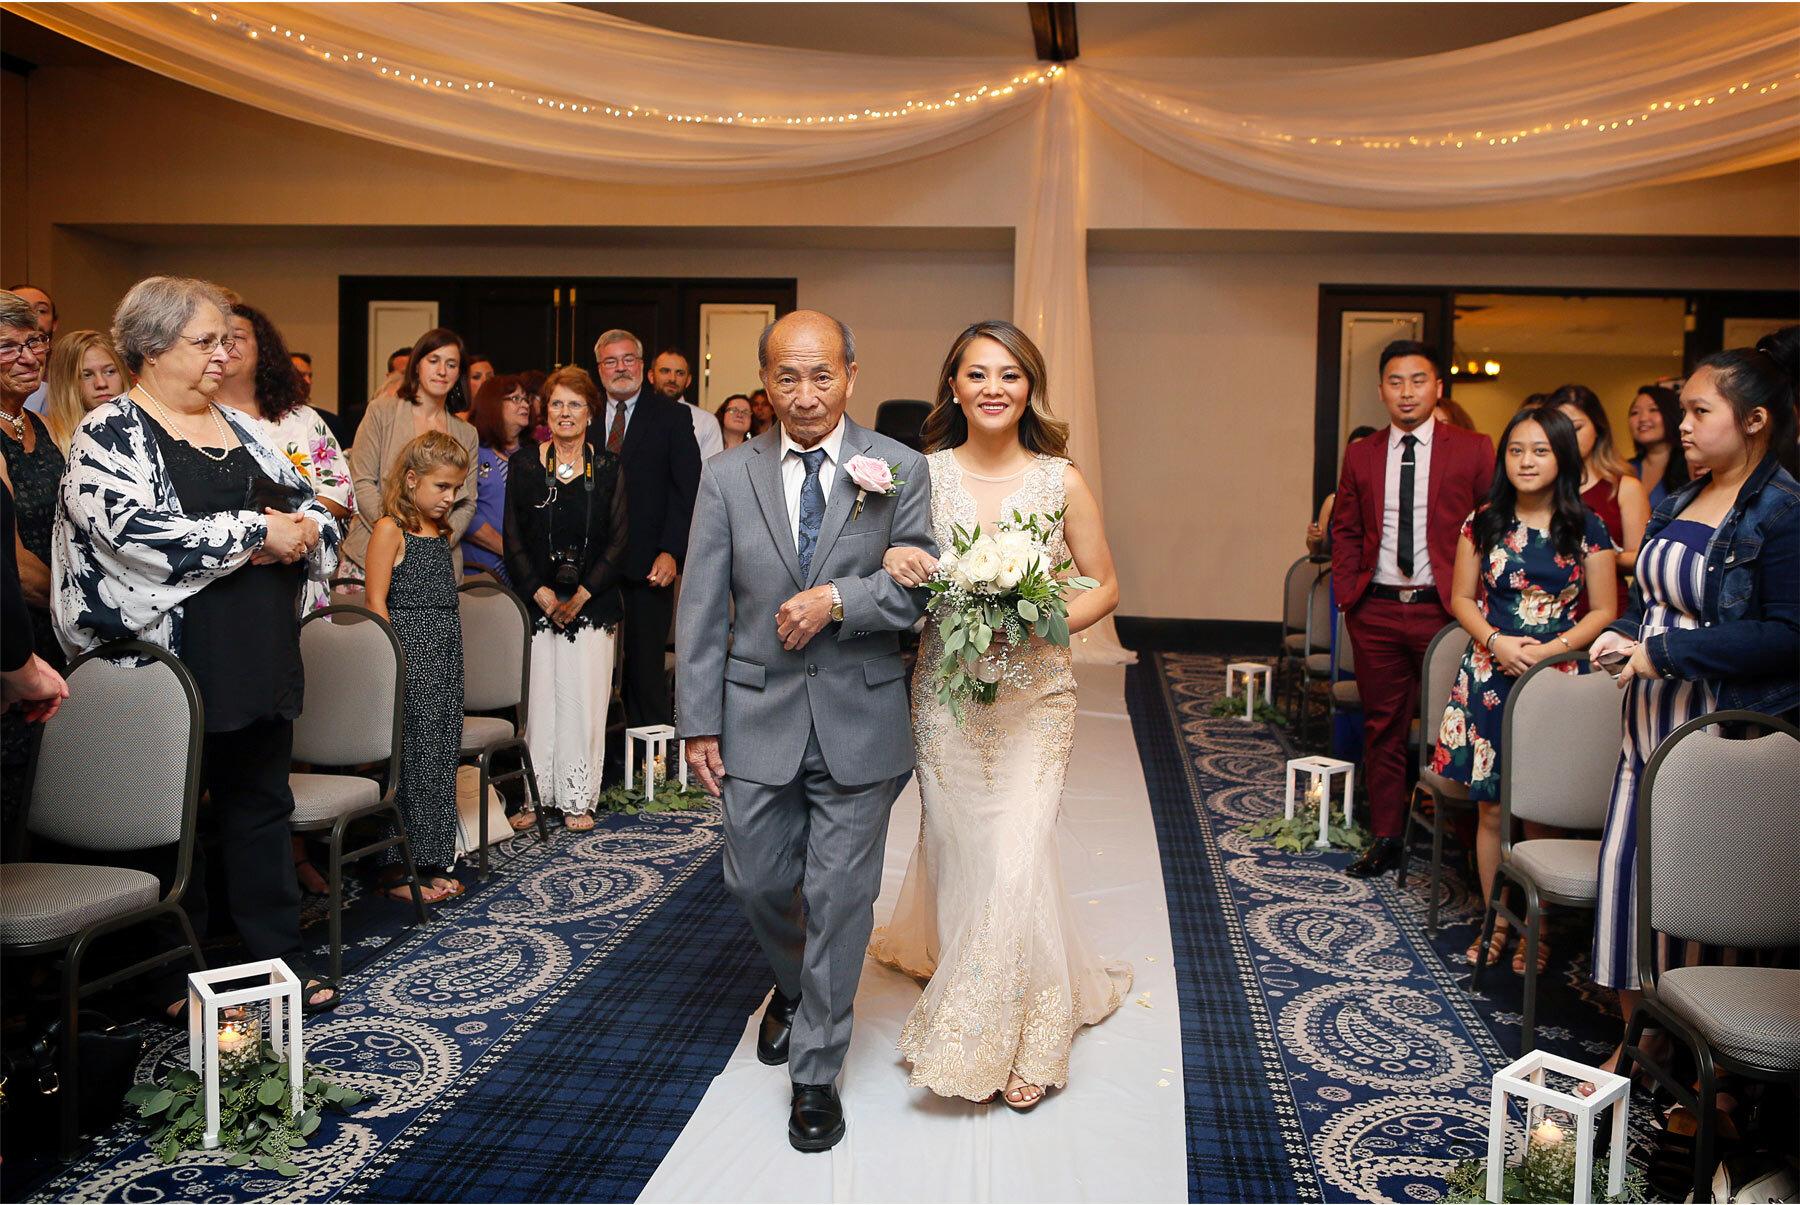 13-Vick-Photography-Minneapolis-Minnesota-The-Graduate-Hotel-Ceremony-Bride-Groom-Father-Mai-&-Ross.jpg